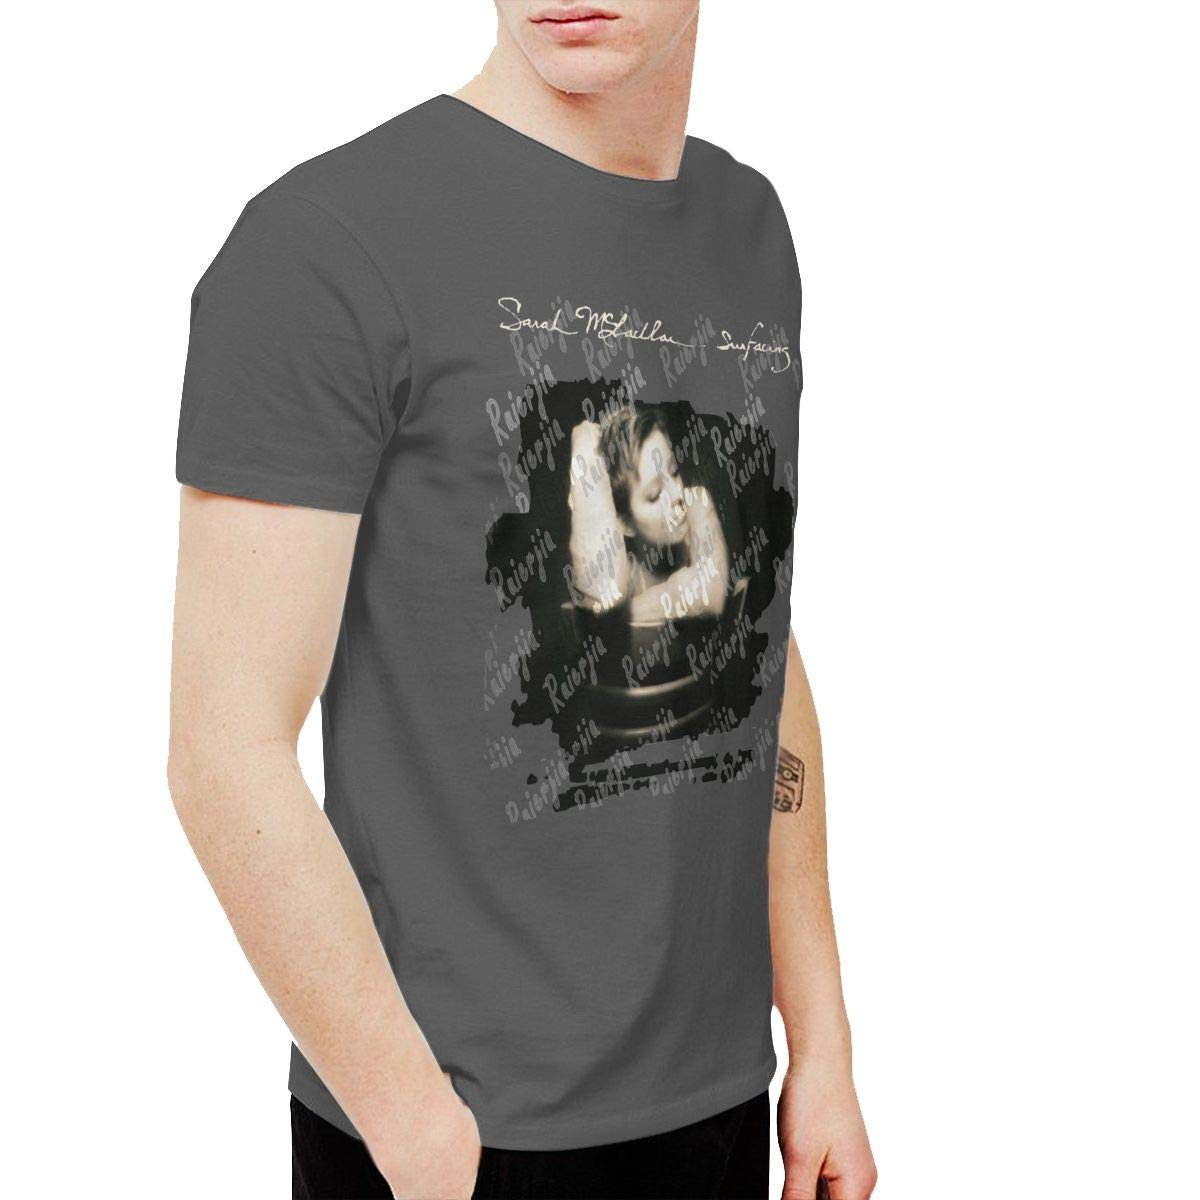 Ruierjia Mens Sarah McLachlan Surfacing T Shirts Deep Heather